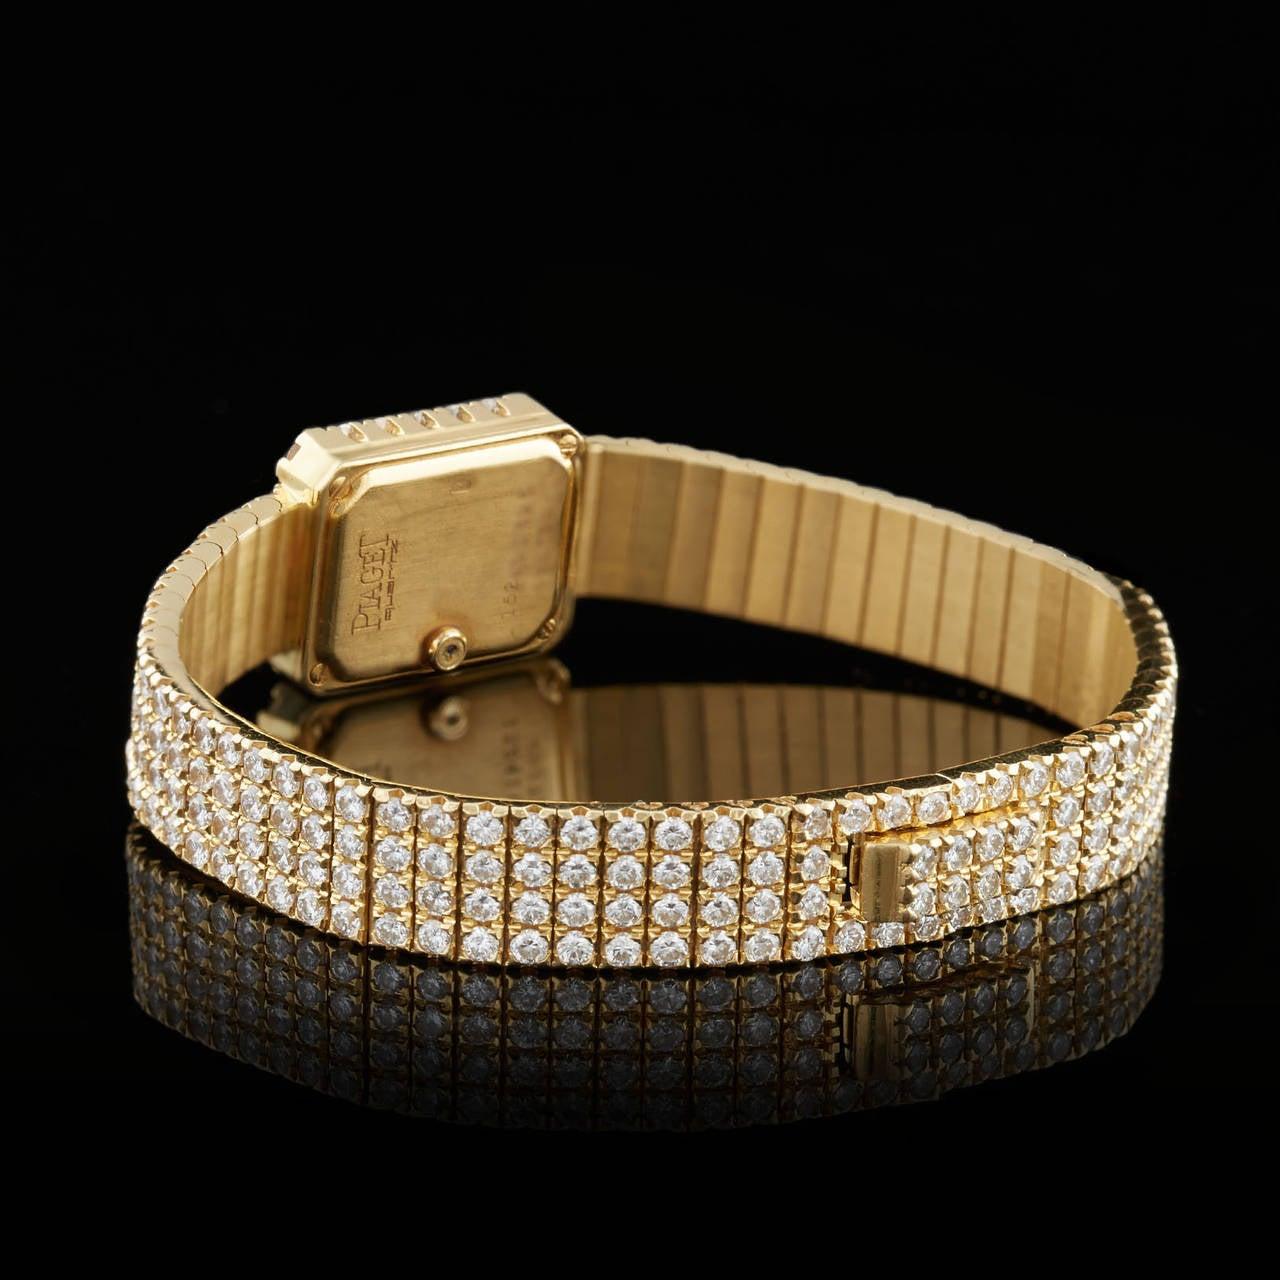 Women's Piaget Lady's Yellow Gold Diamond Pave Wristwatch